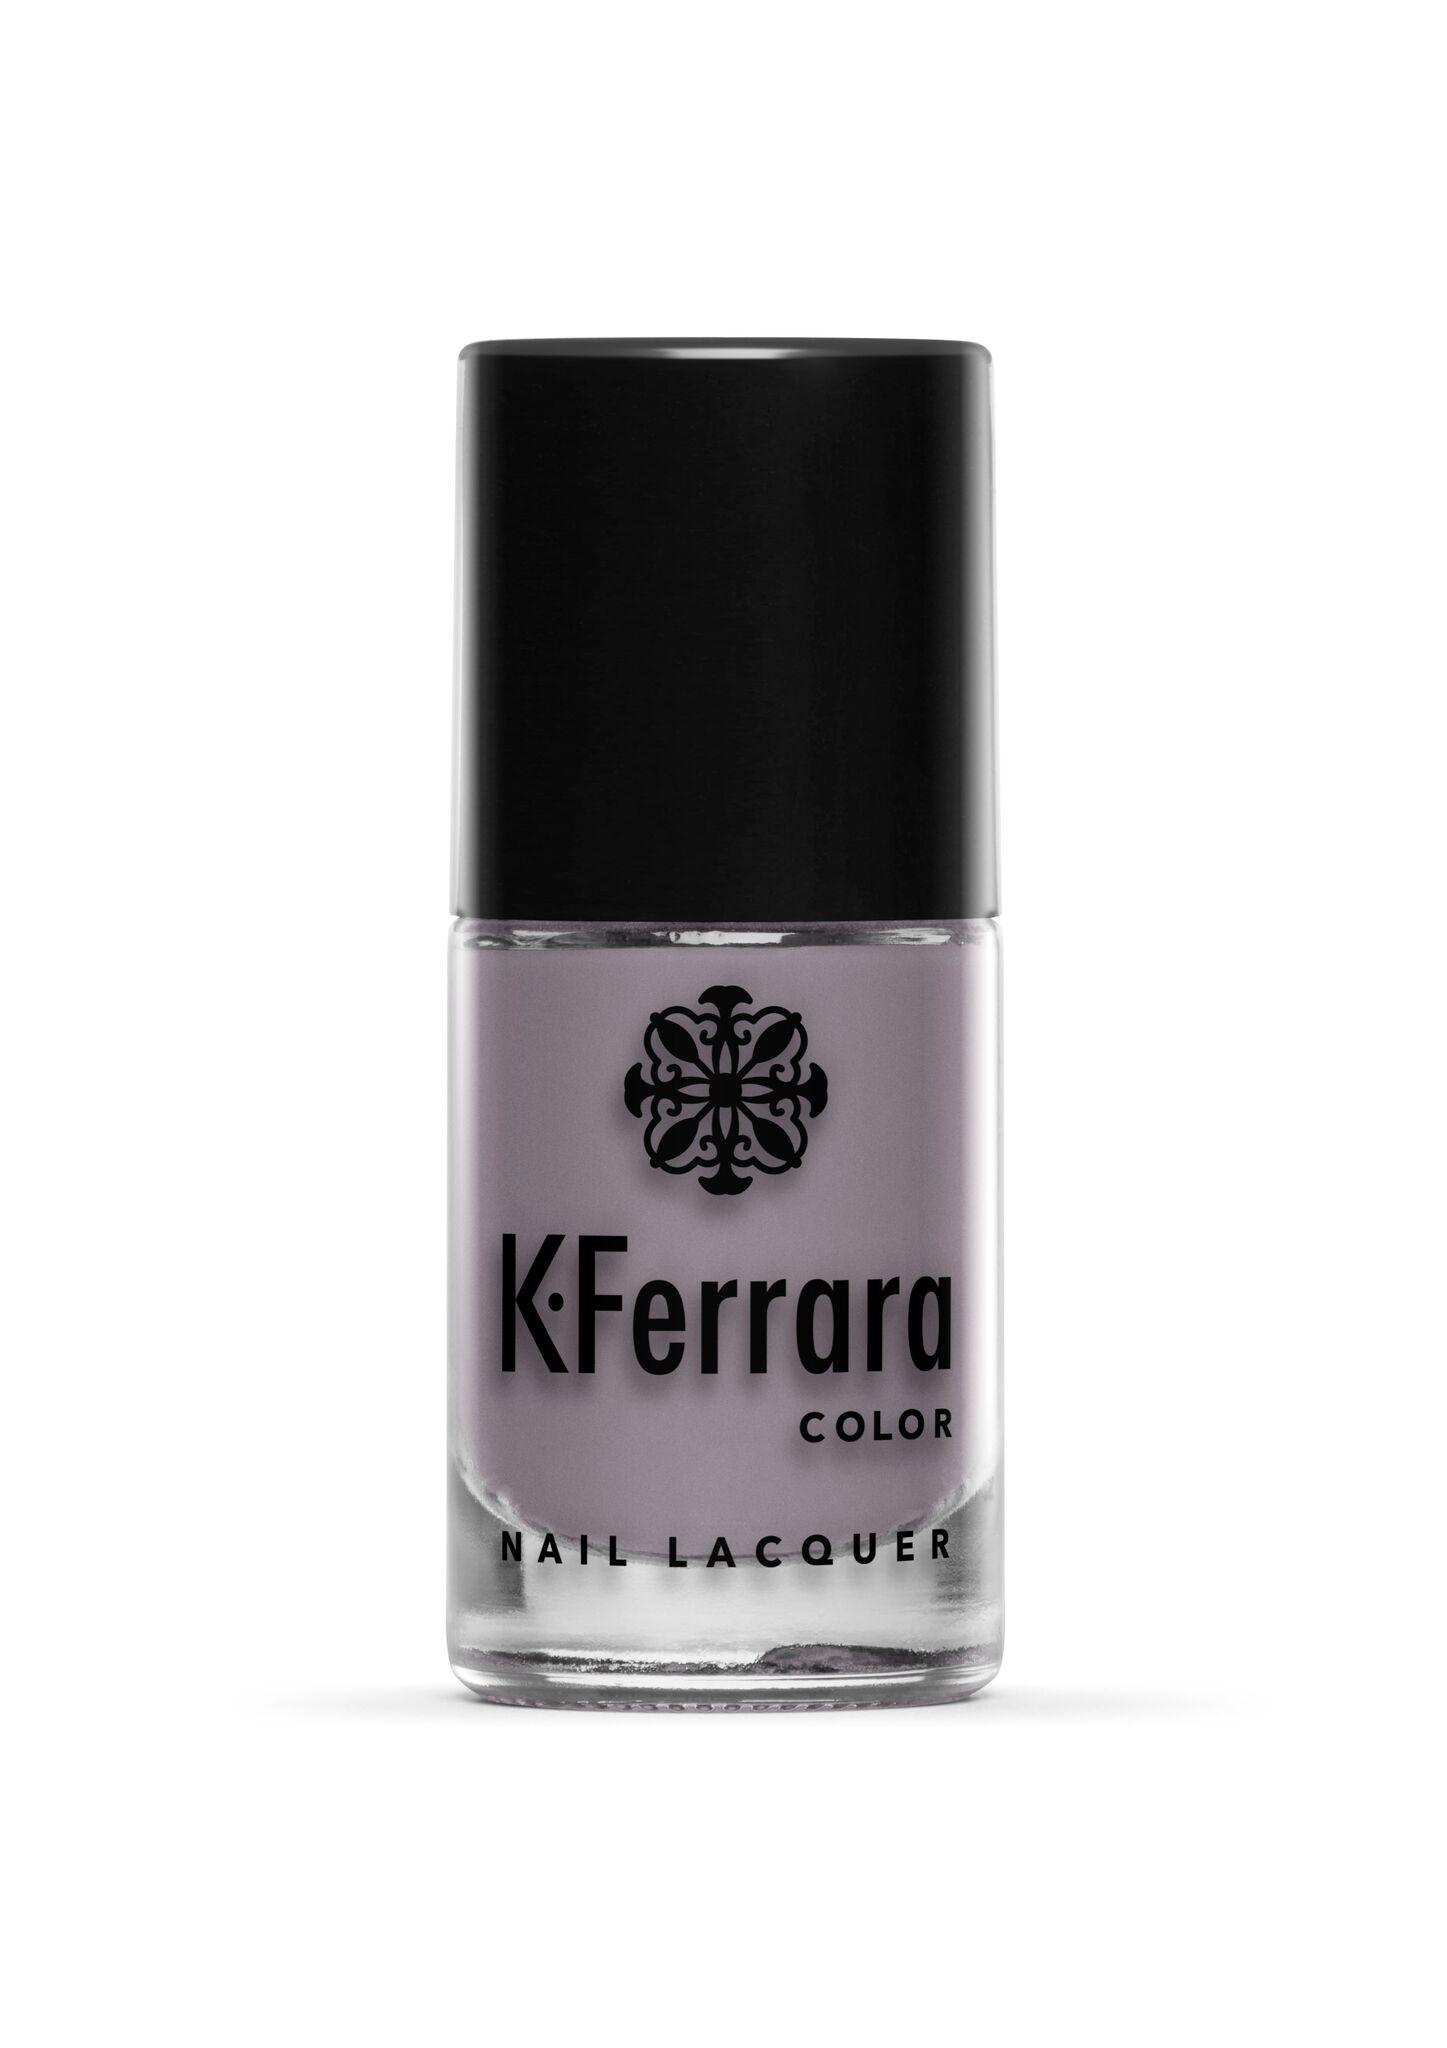 ef40ef86e282-KFerrara_Bottle_Lydia.jpg